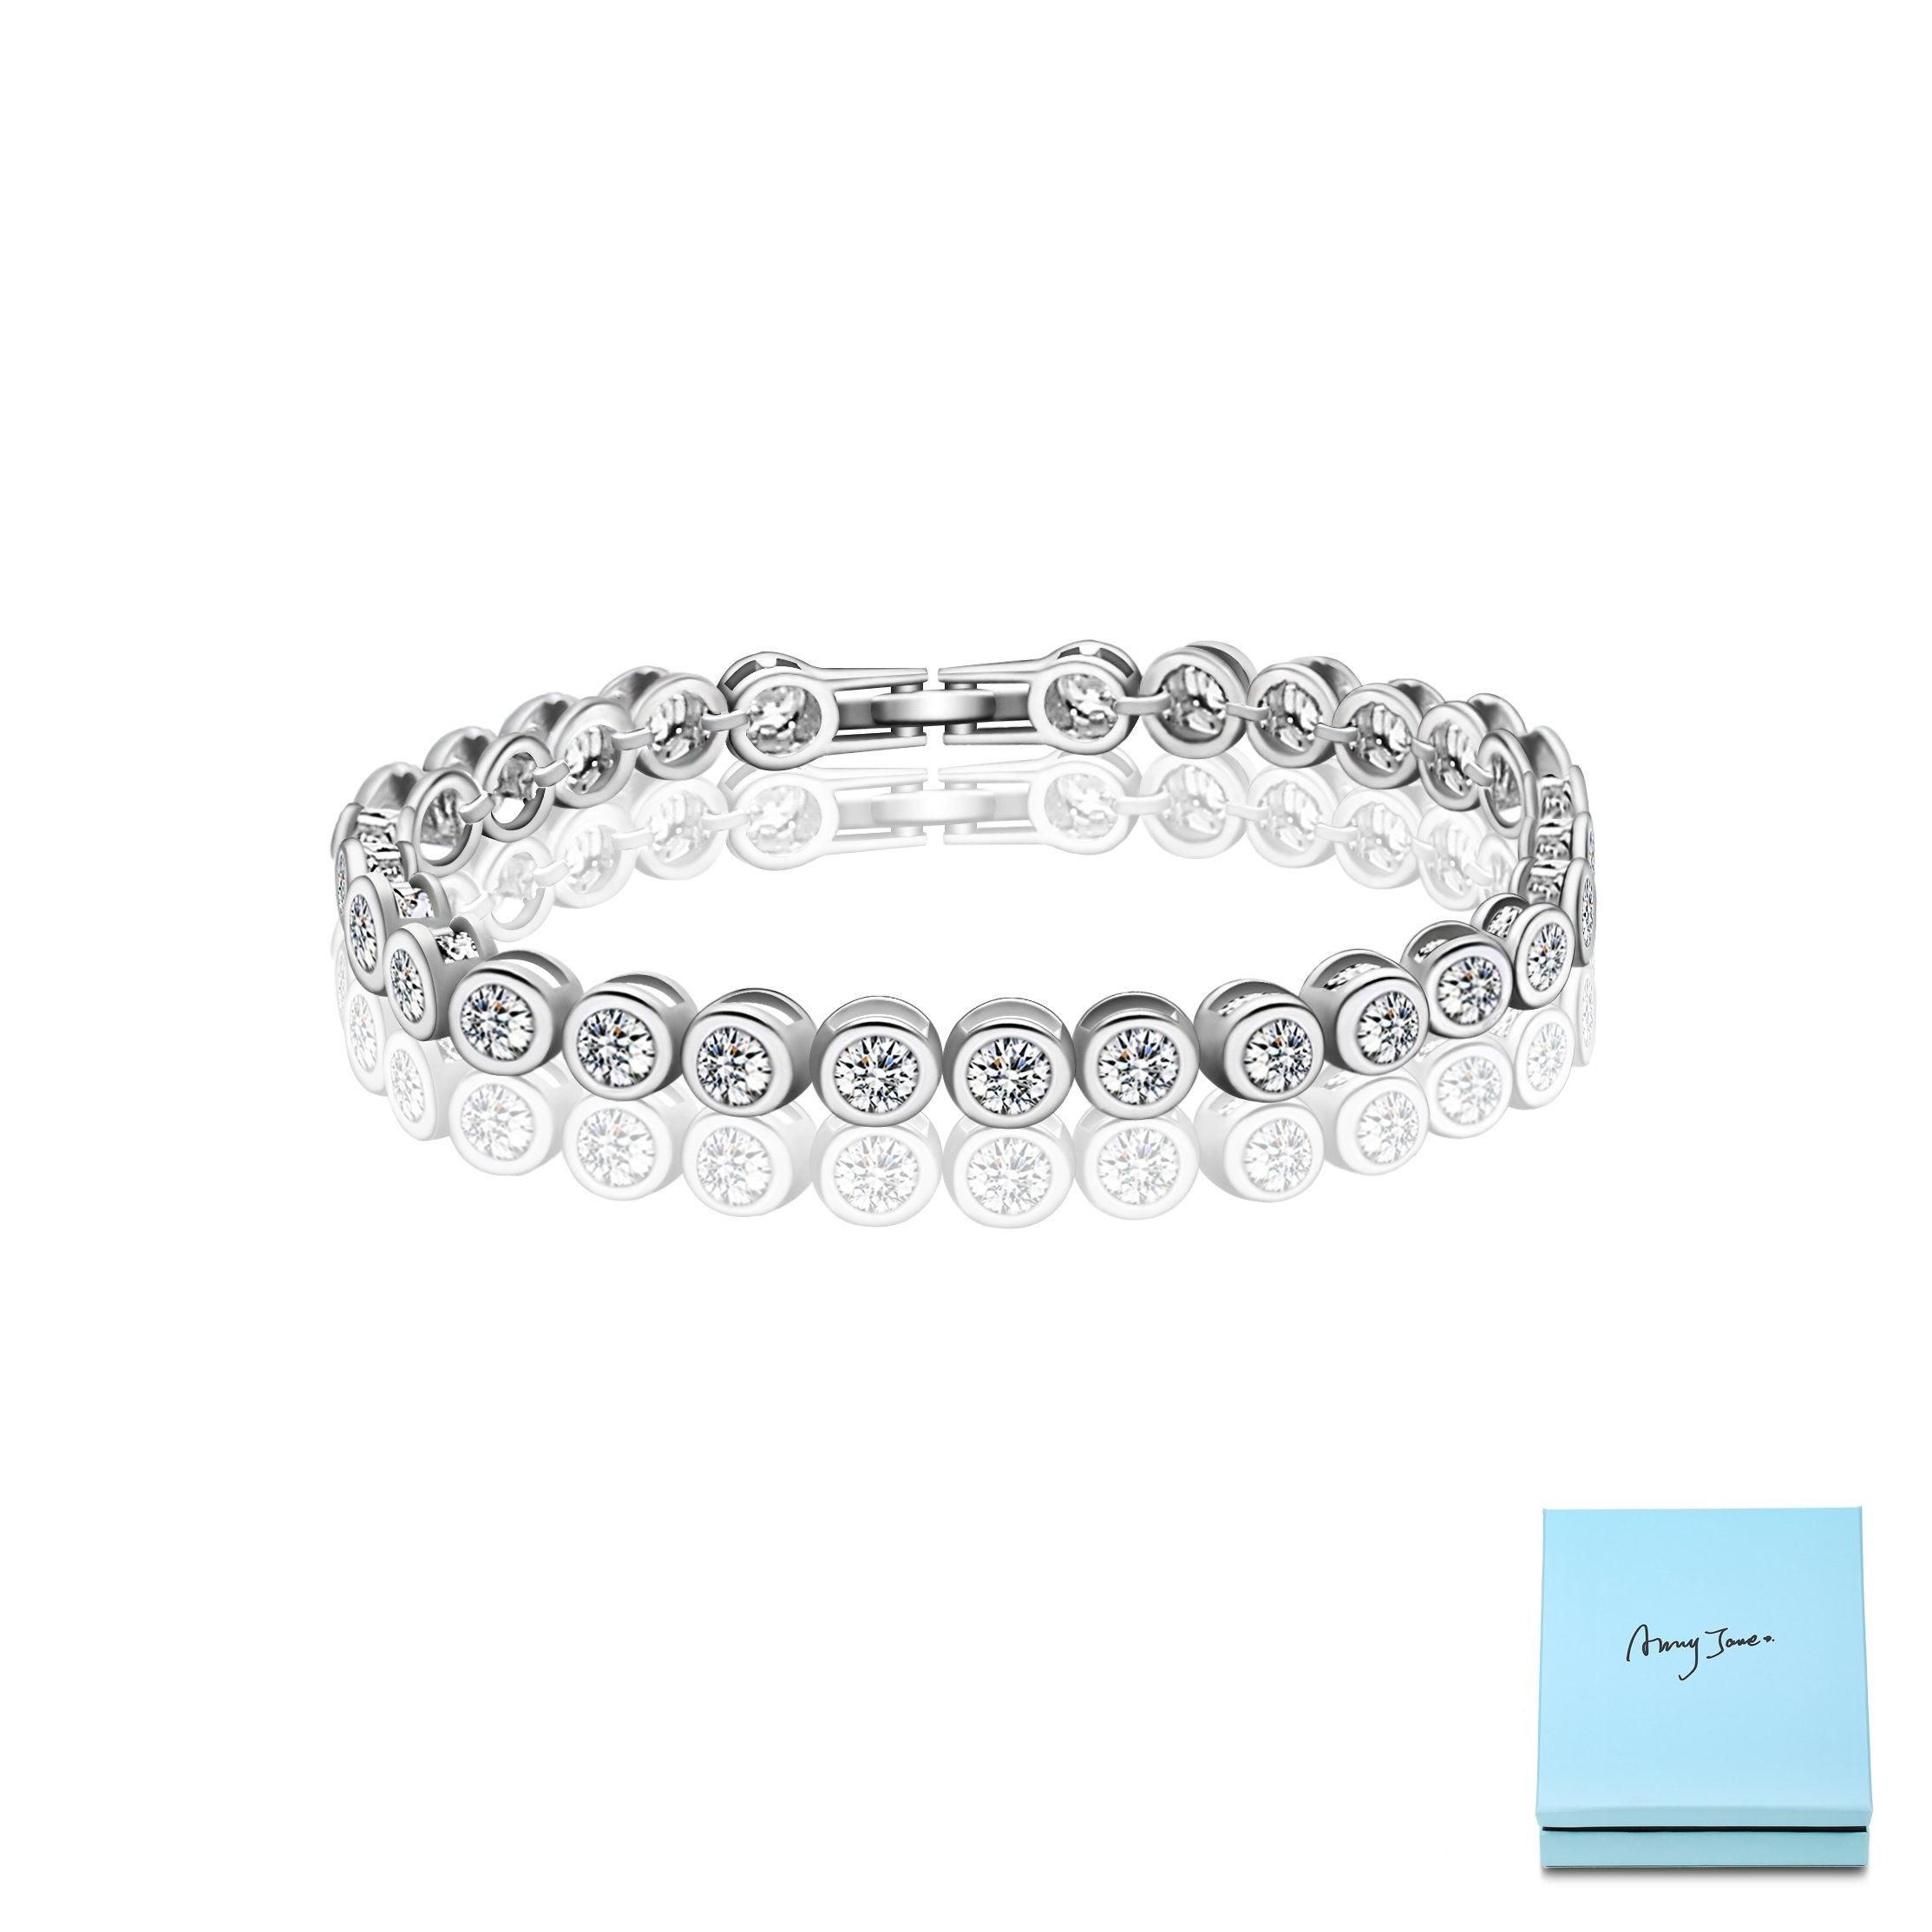 AMYJANE CZ Tennis Bracelet for Woman - Round Swarovski Elements Crystal Cubic Zirconia Bridesmaids Gift Bracelet for Wedding Bridal Jewelry for Small Wrist